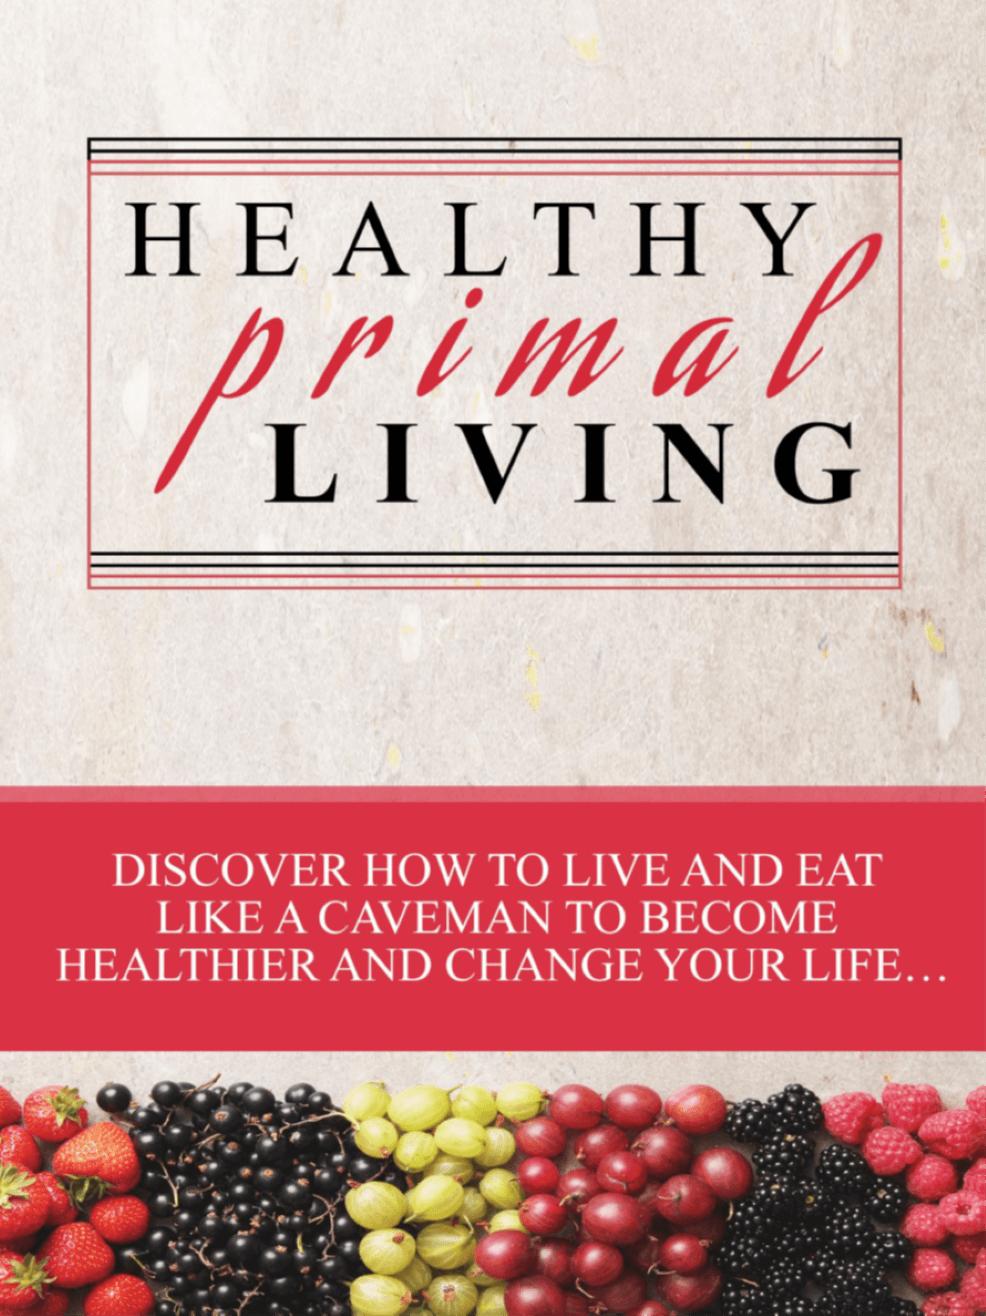 Healthy Primal Living